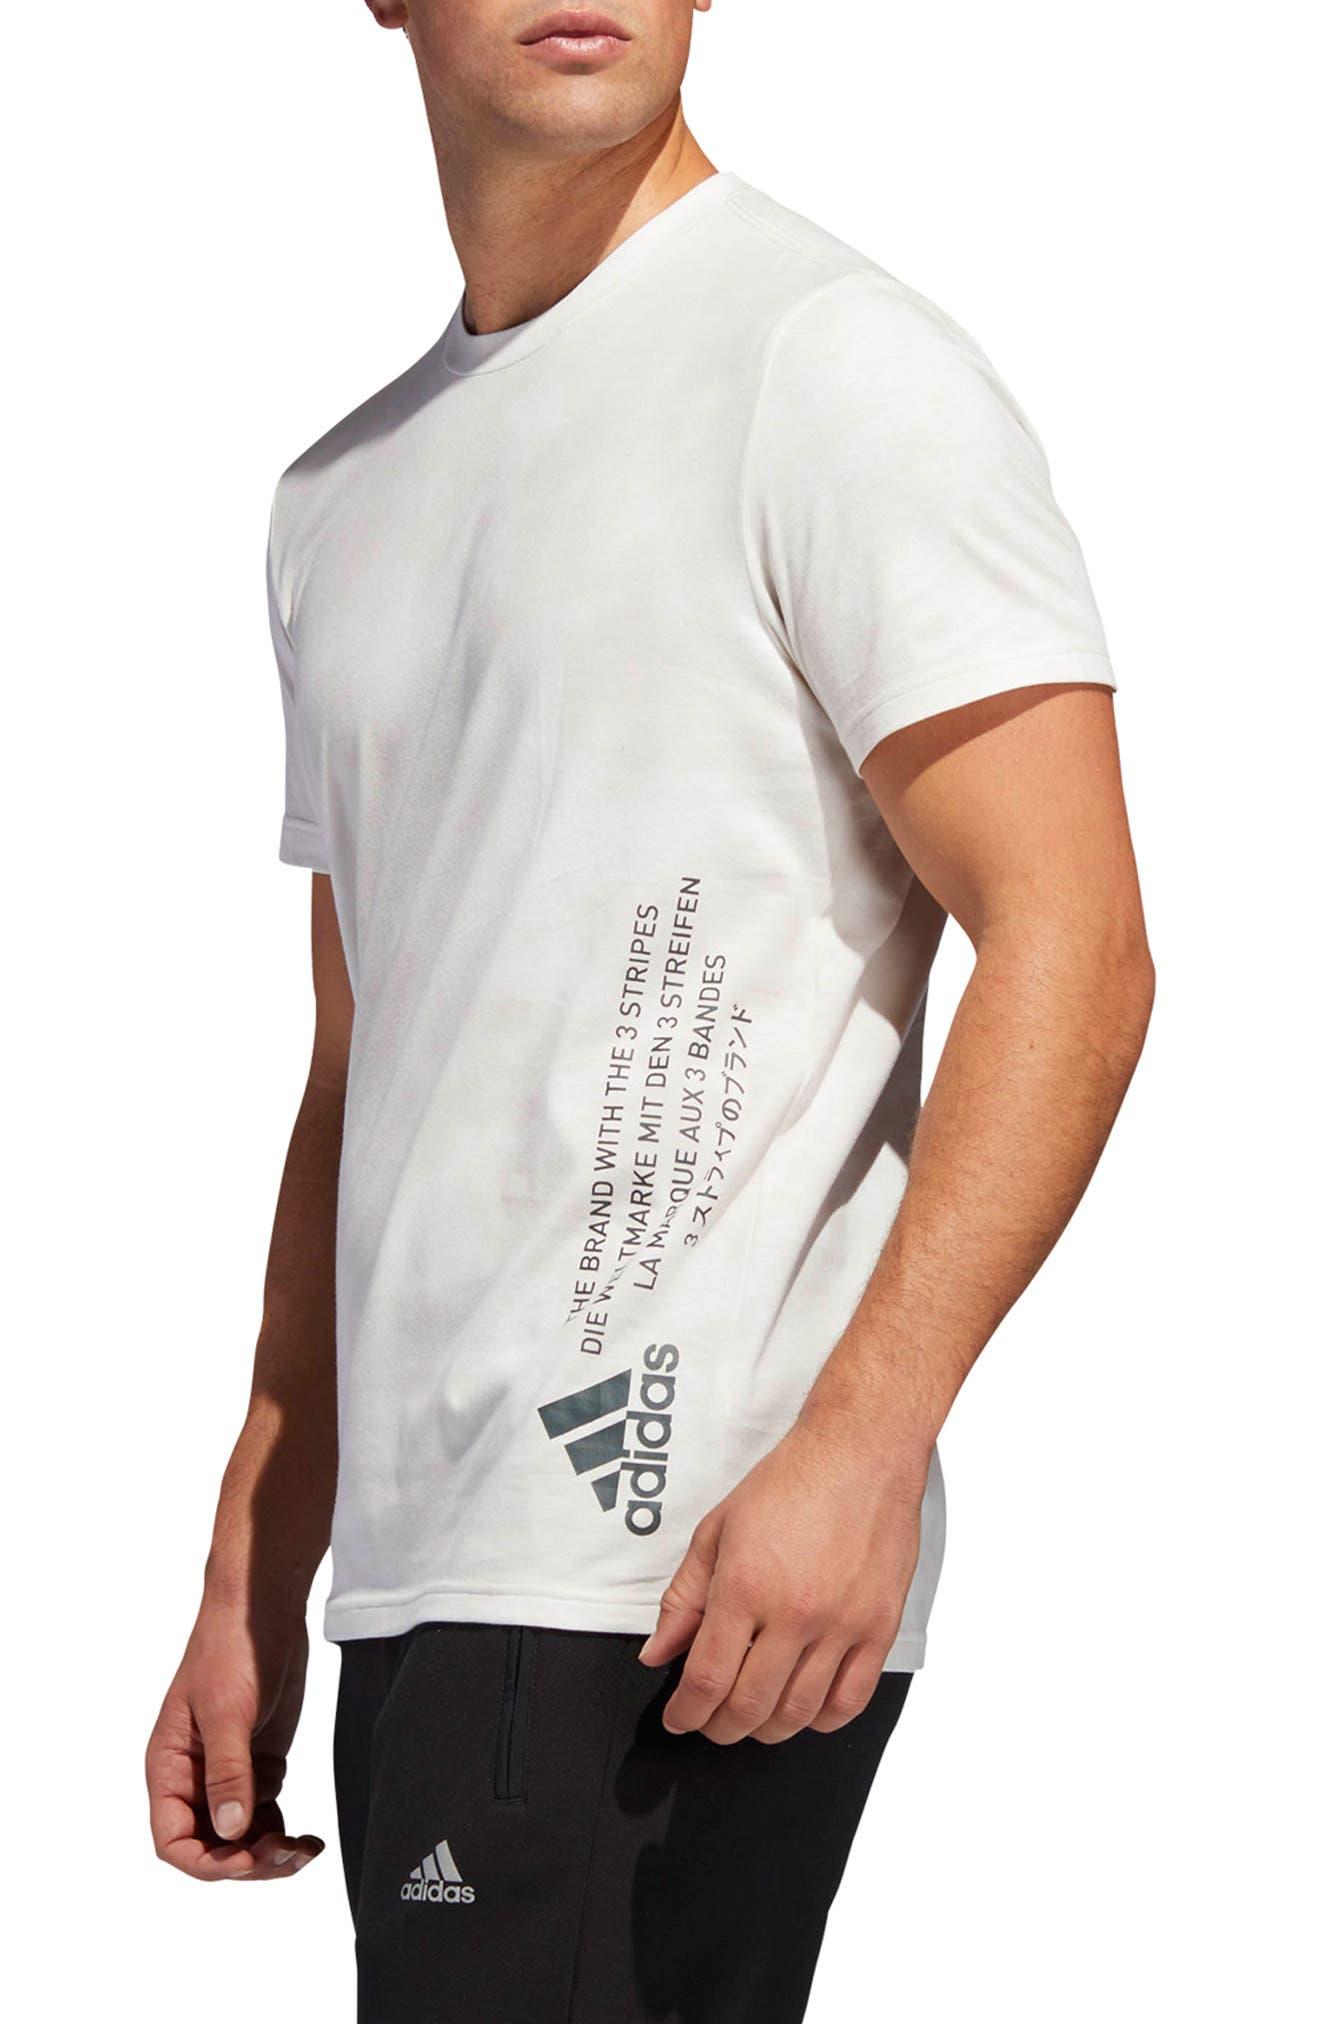 check out 8beba c131f Men s Adidas T-Shirts, Tank Tops,   Graphic Tees   Nordstrom